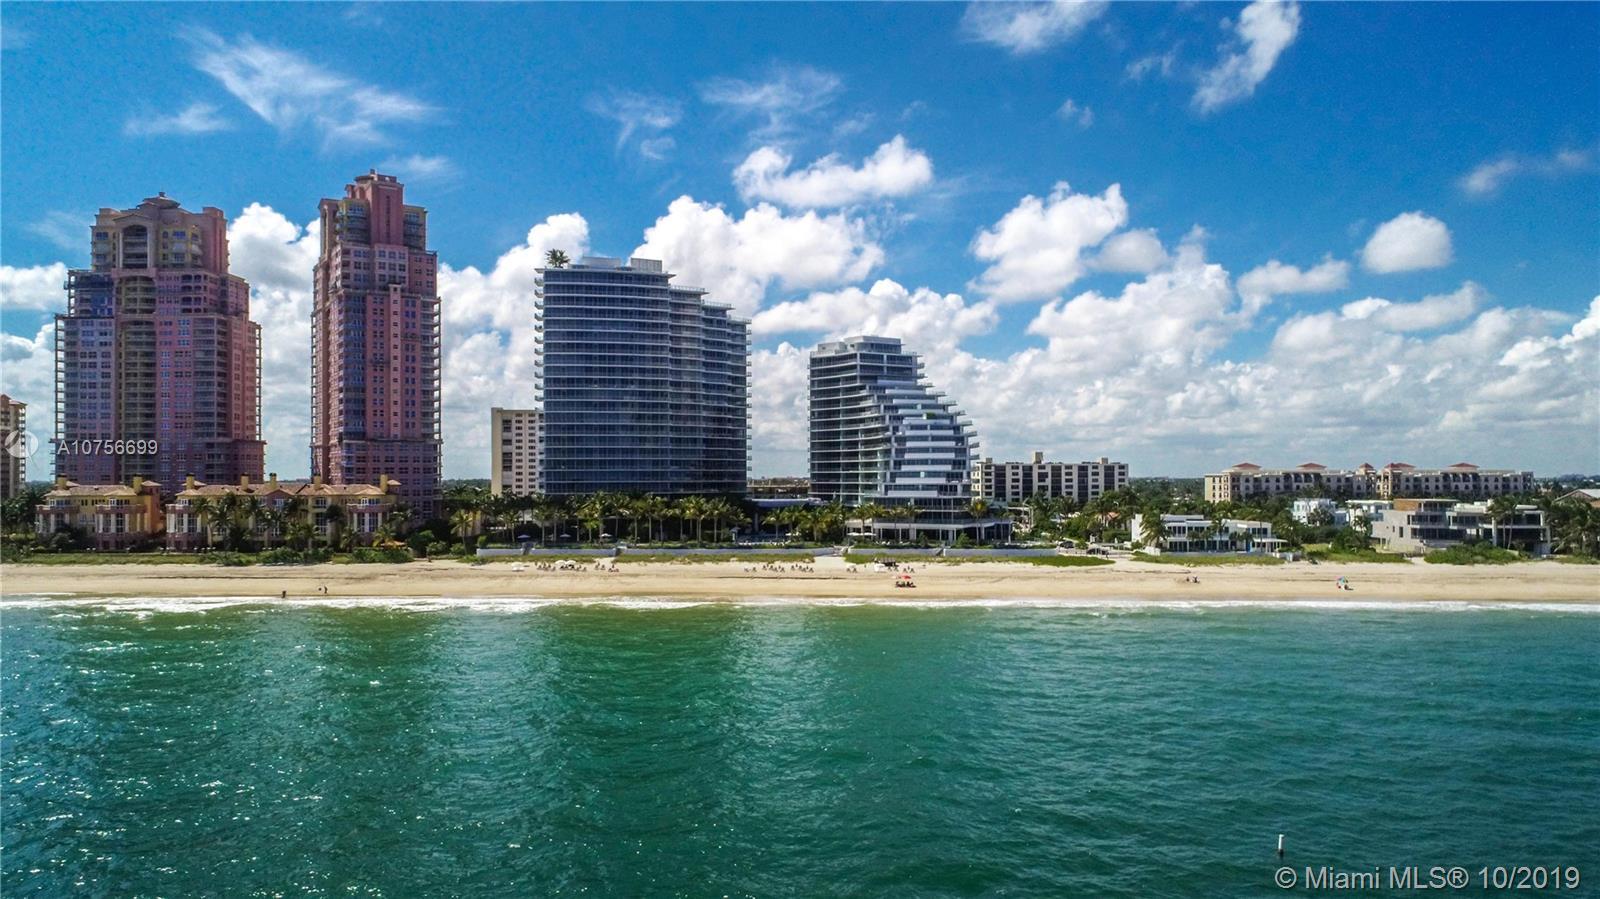 2200 N Ocean Blvd, S405 - Fort Lauderdale, Florida